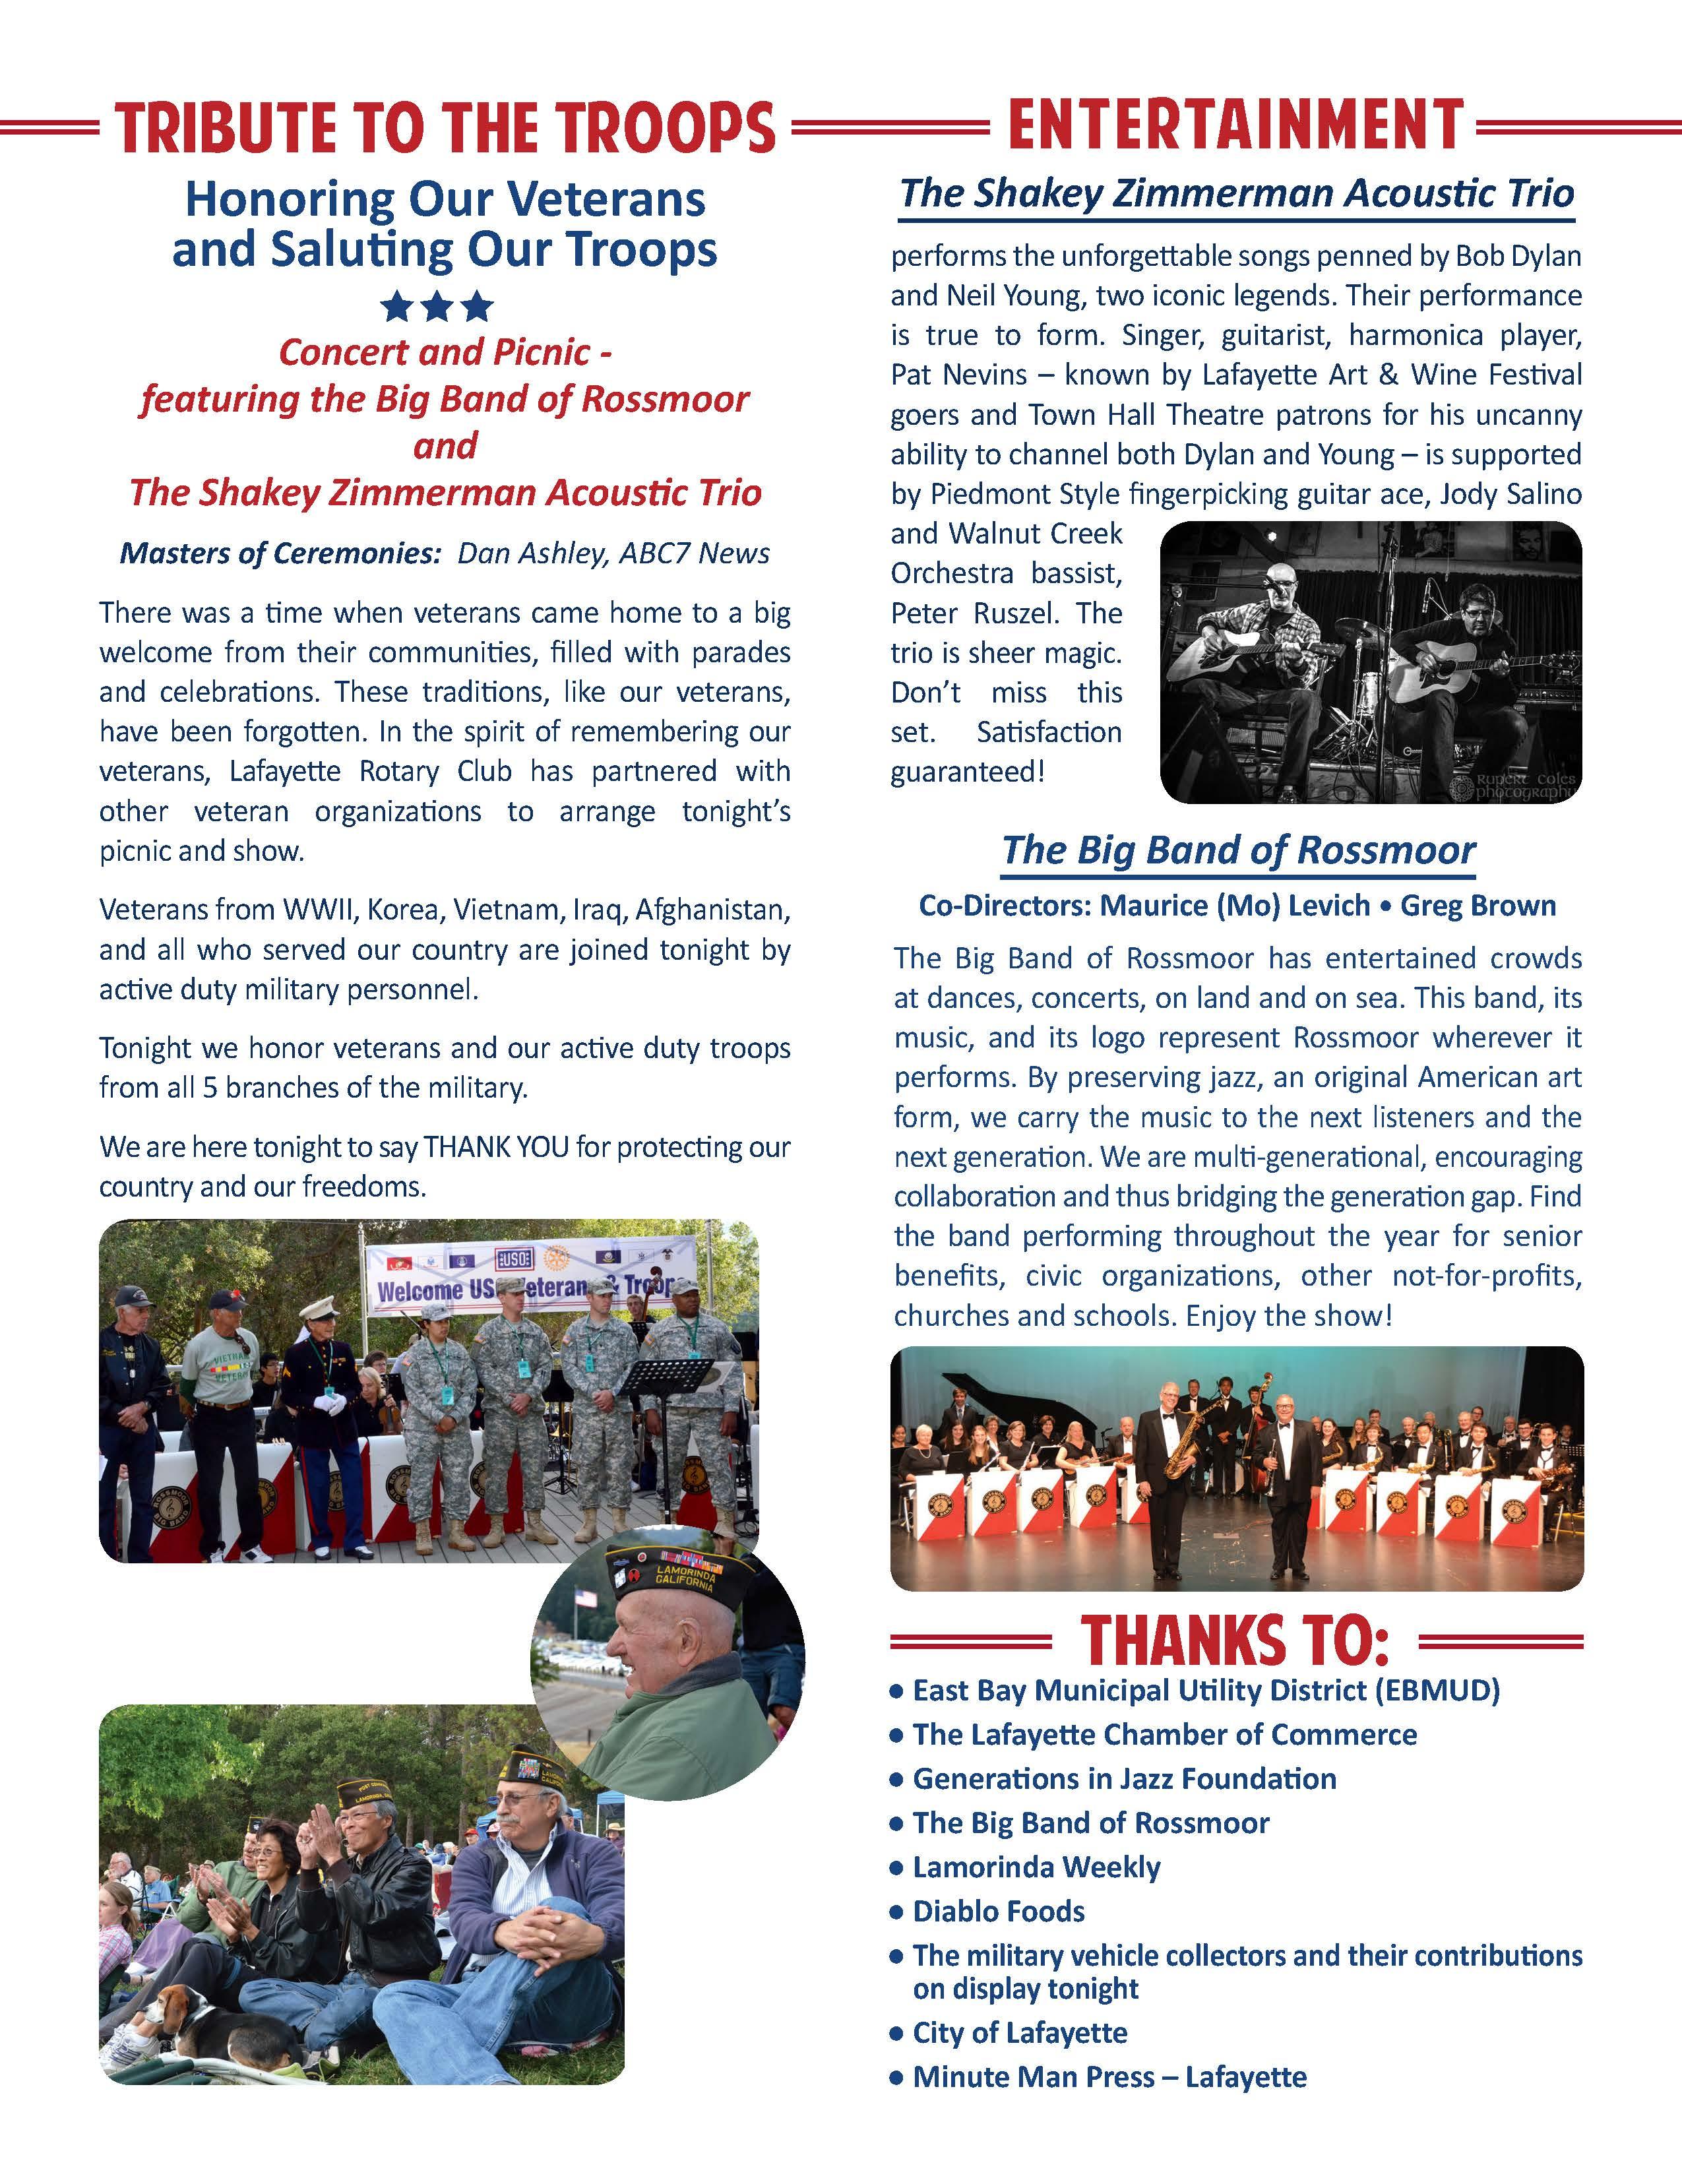 USO Brochure 8.5x11 (6-21) (1)_Page_2